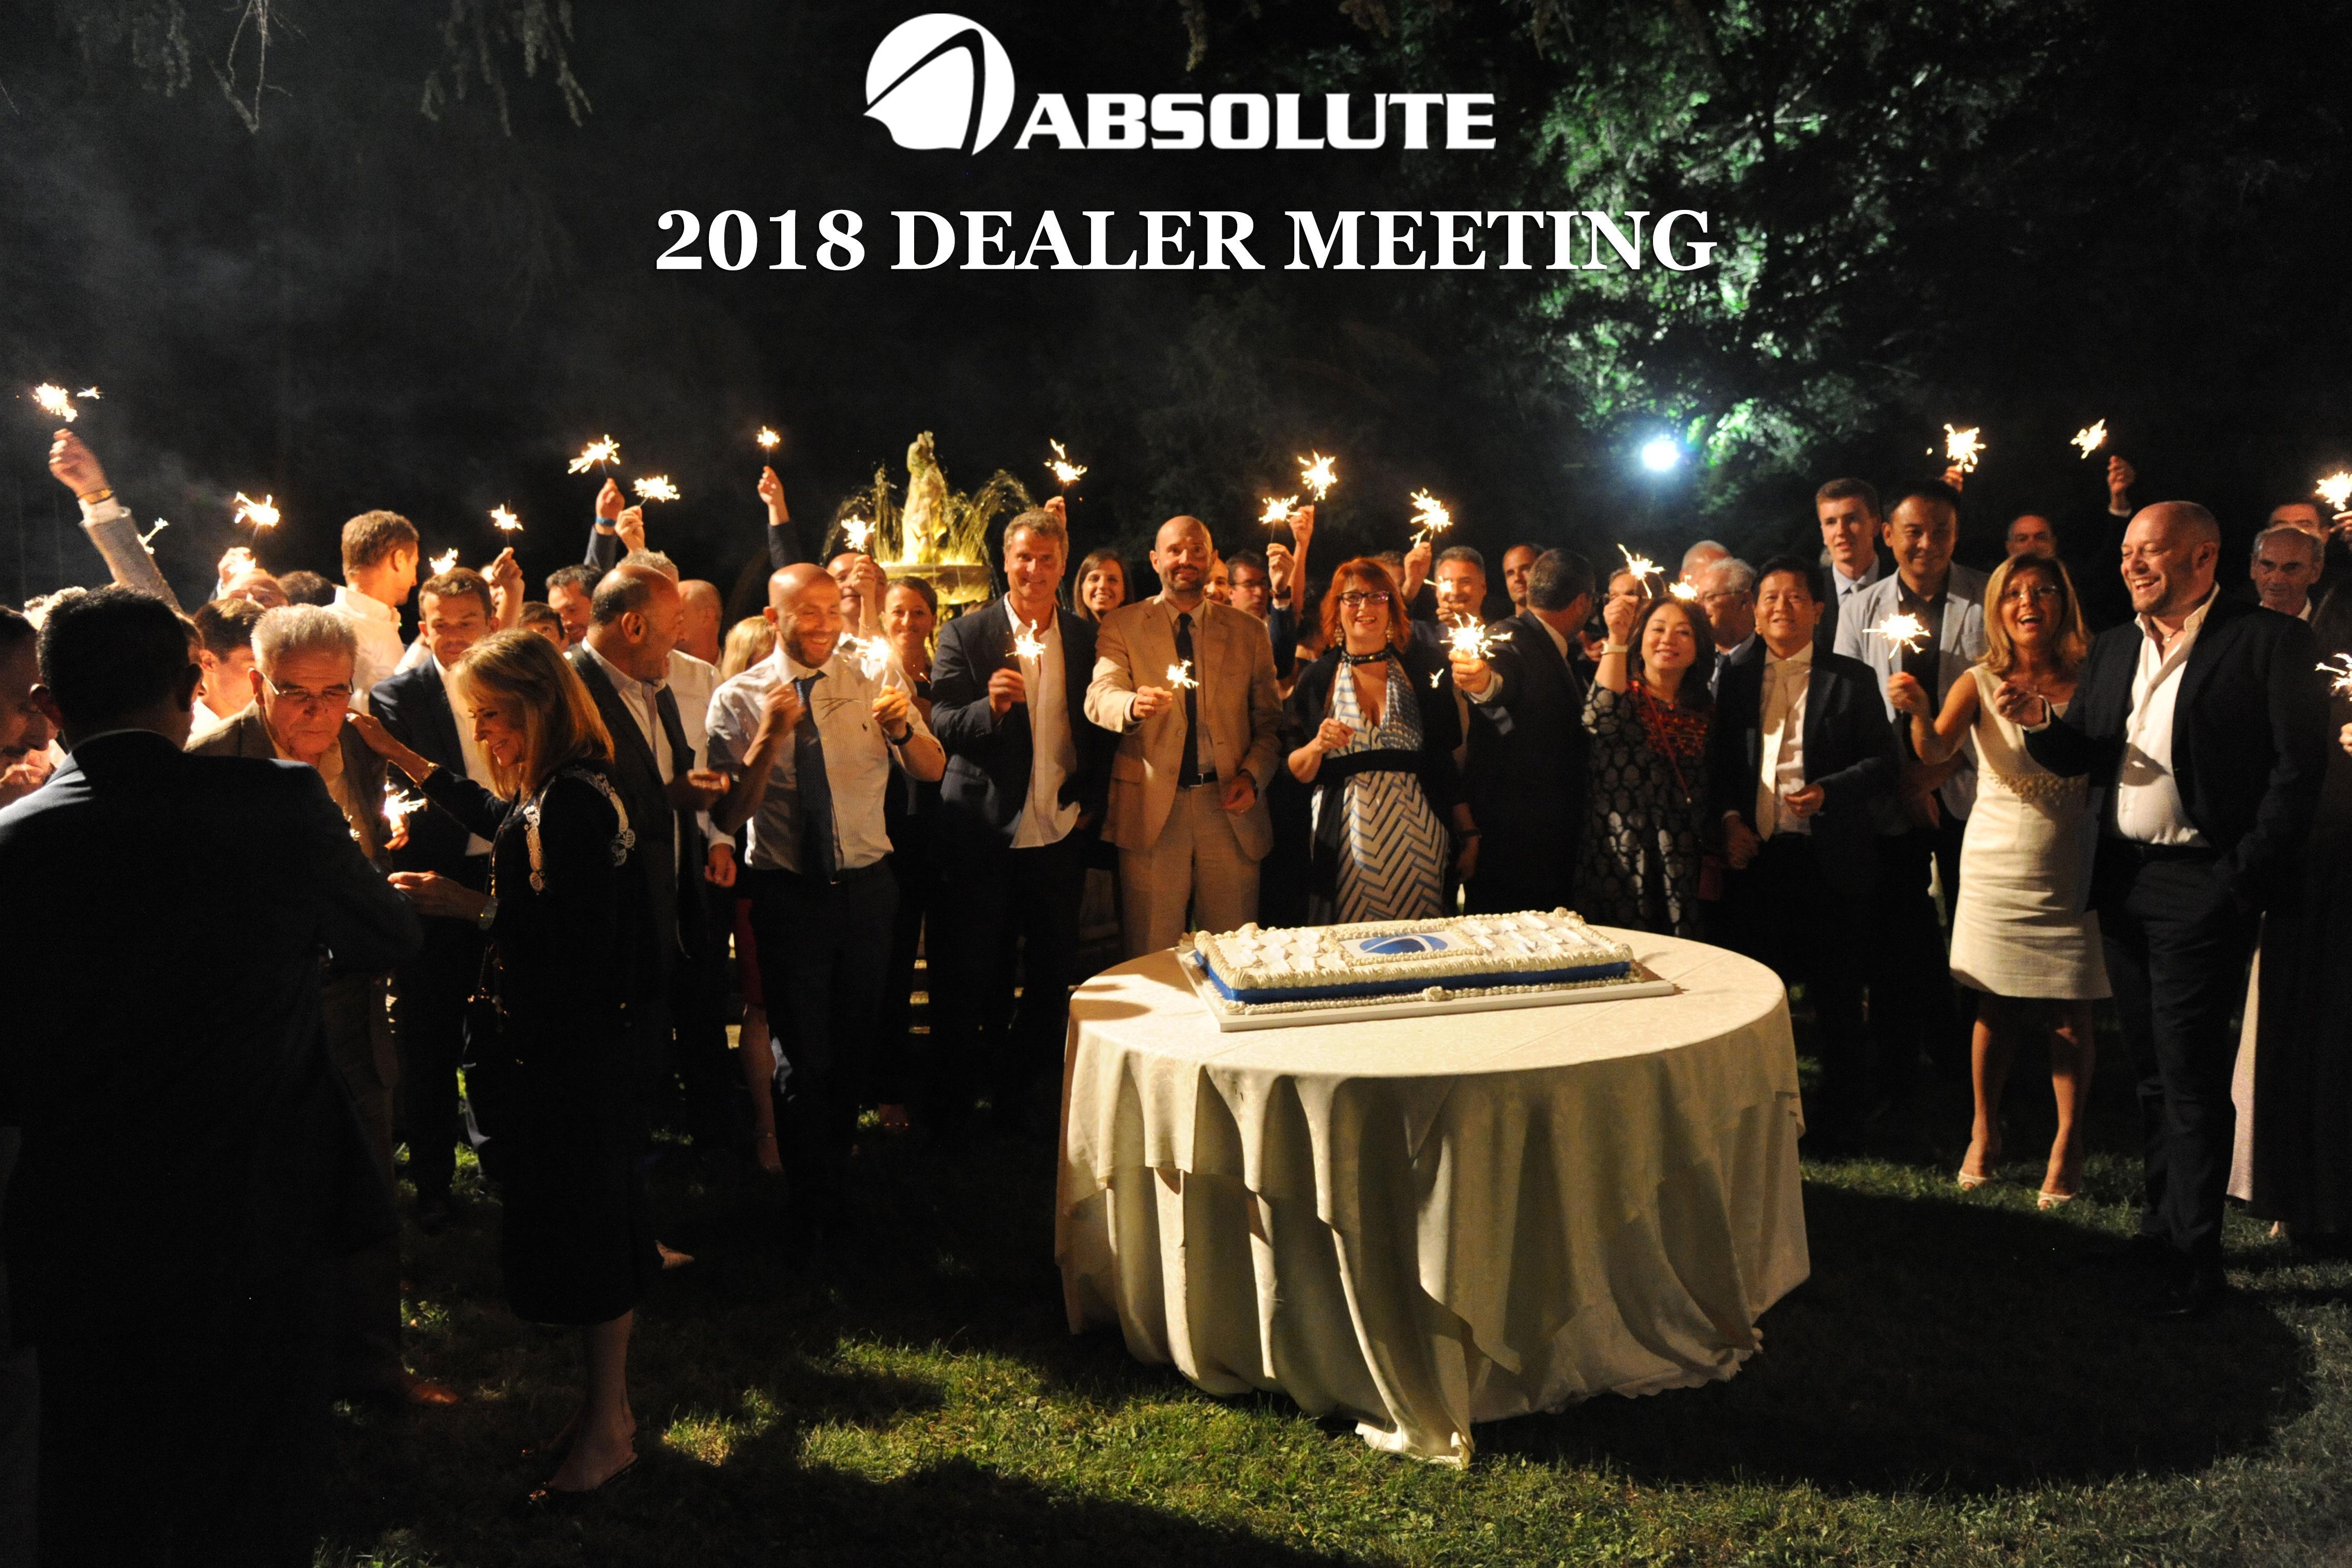 Absolute Dealer Meeting 2018